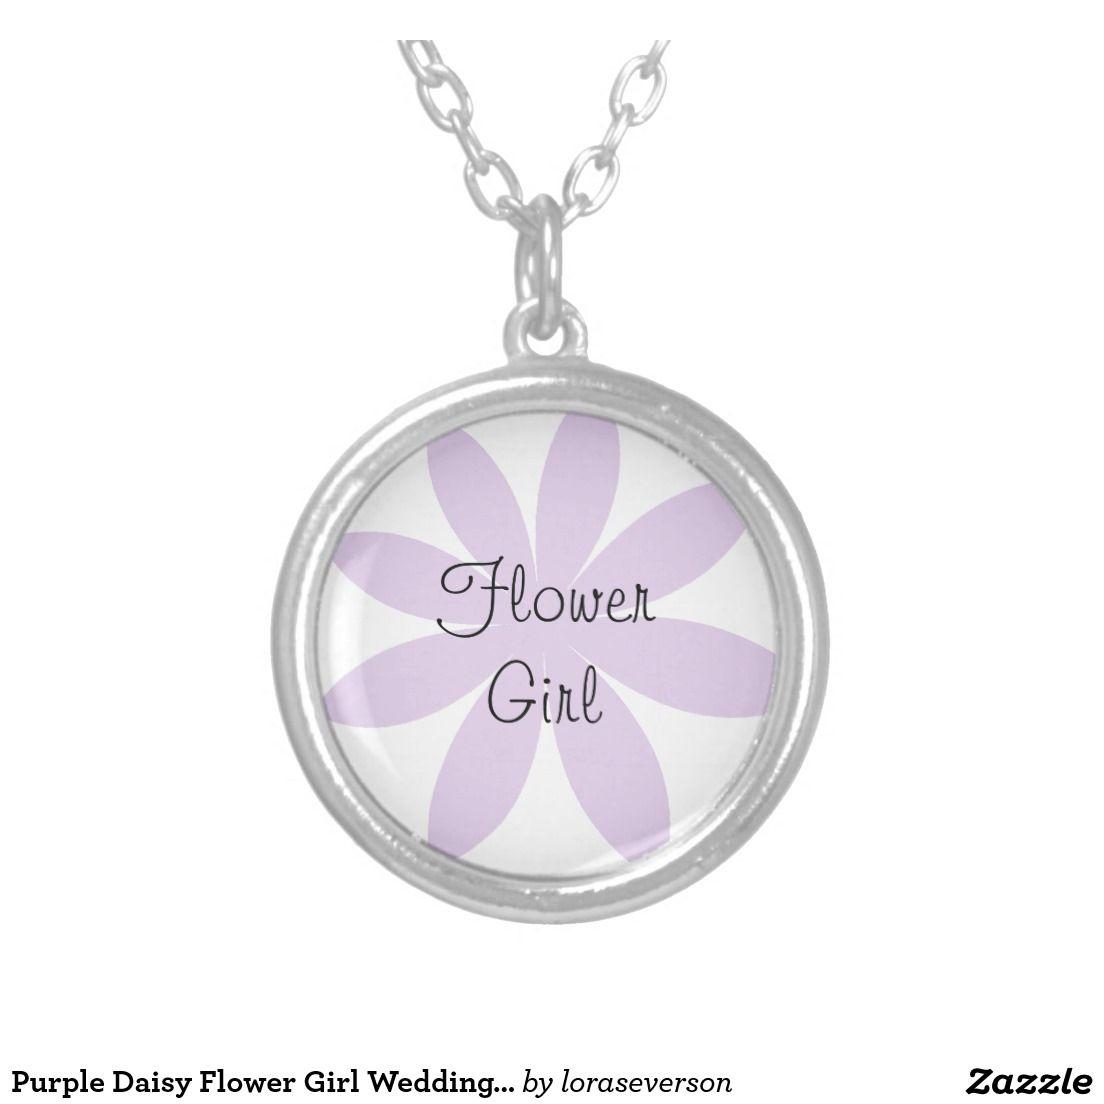 Purple Daisy Flower Girl Wedding Necklace